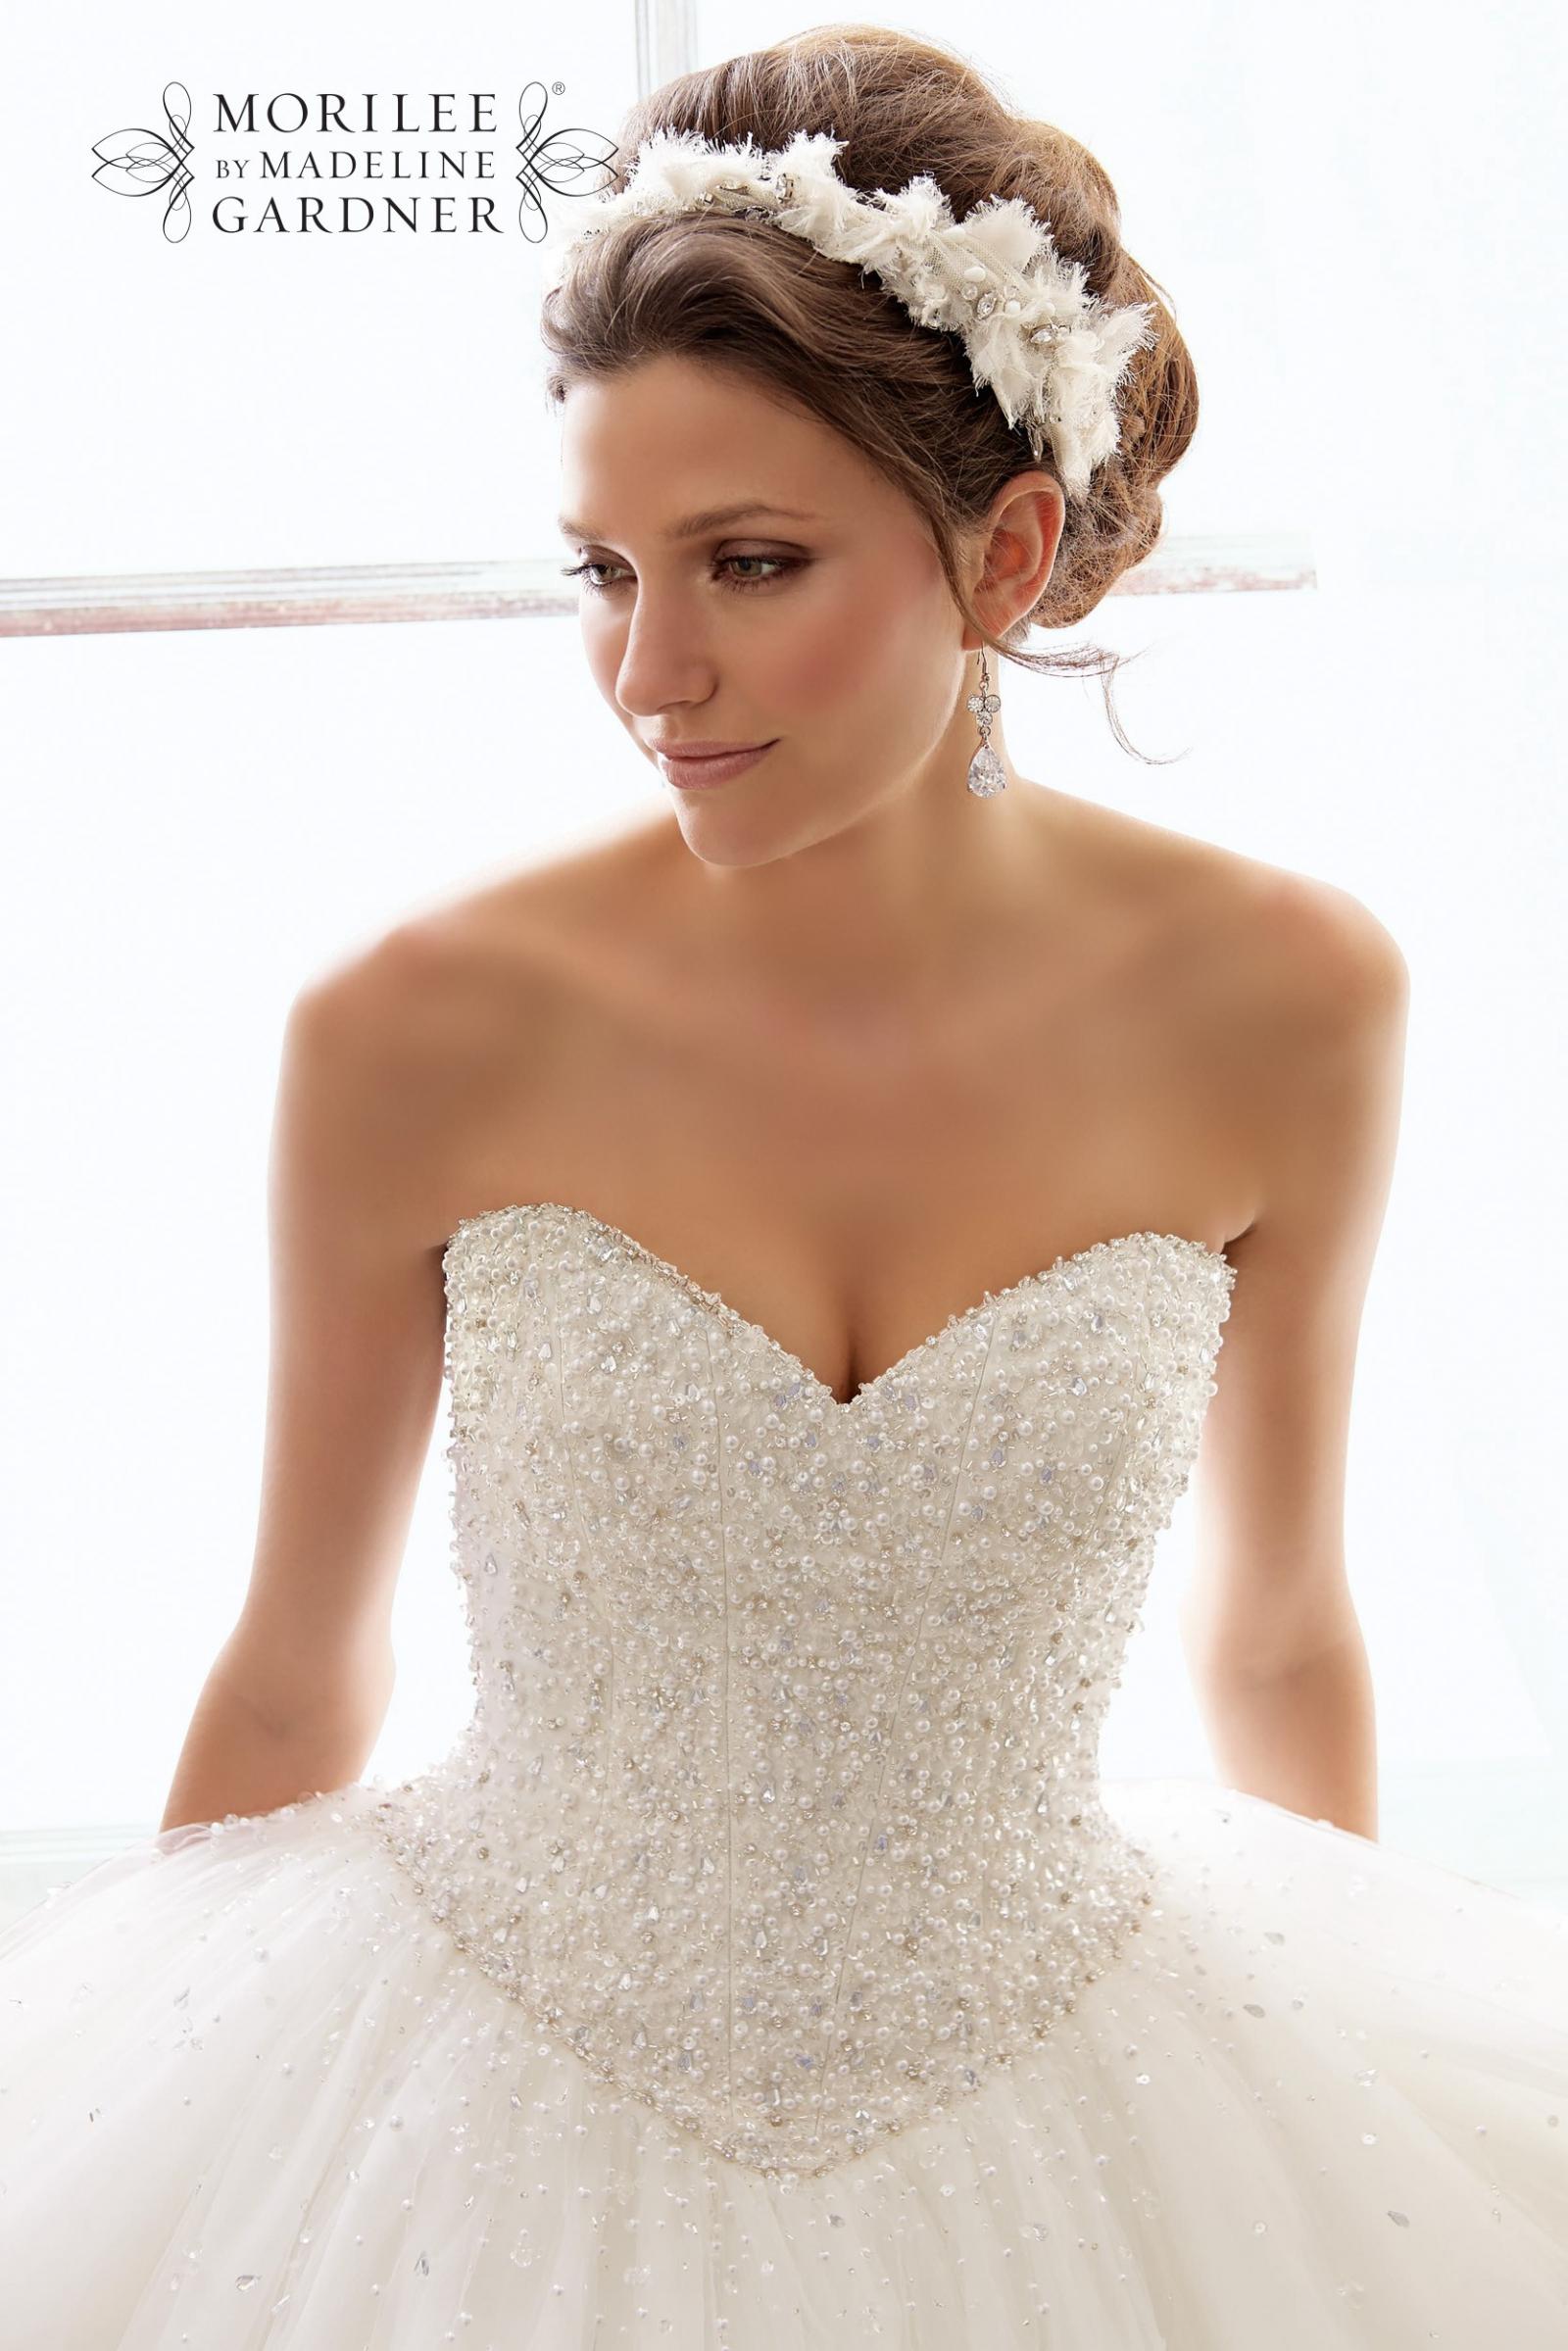 Morilee 5216 Second Hand Wedding Dress on Sale 65% Off